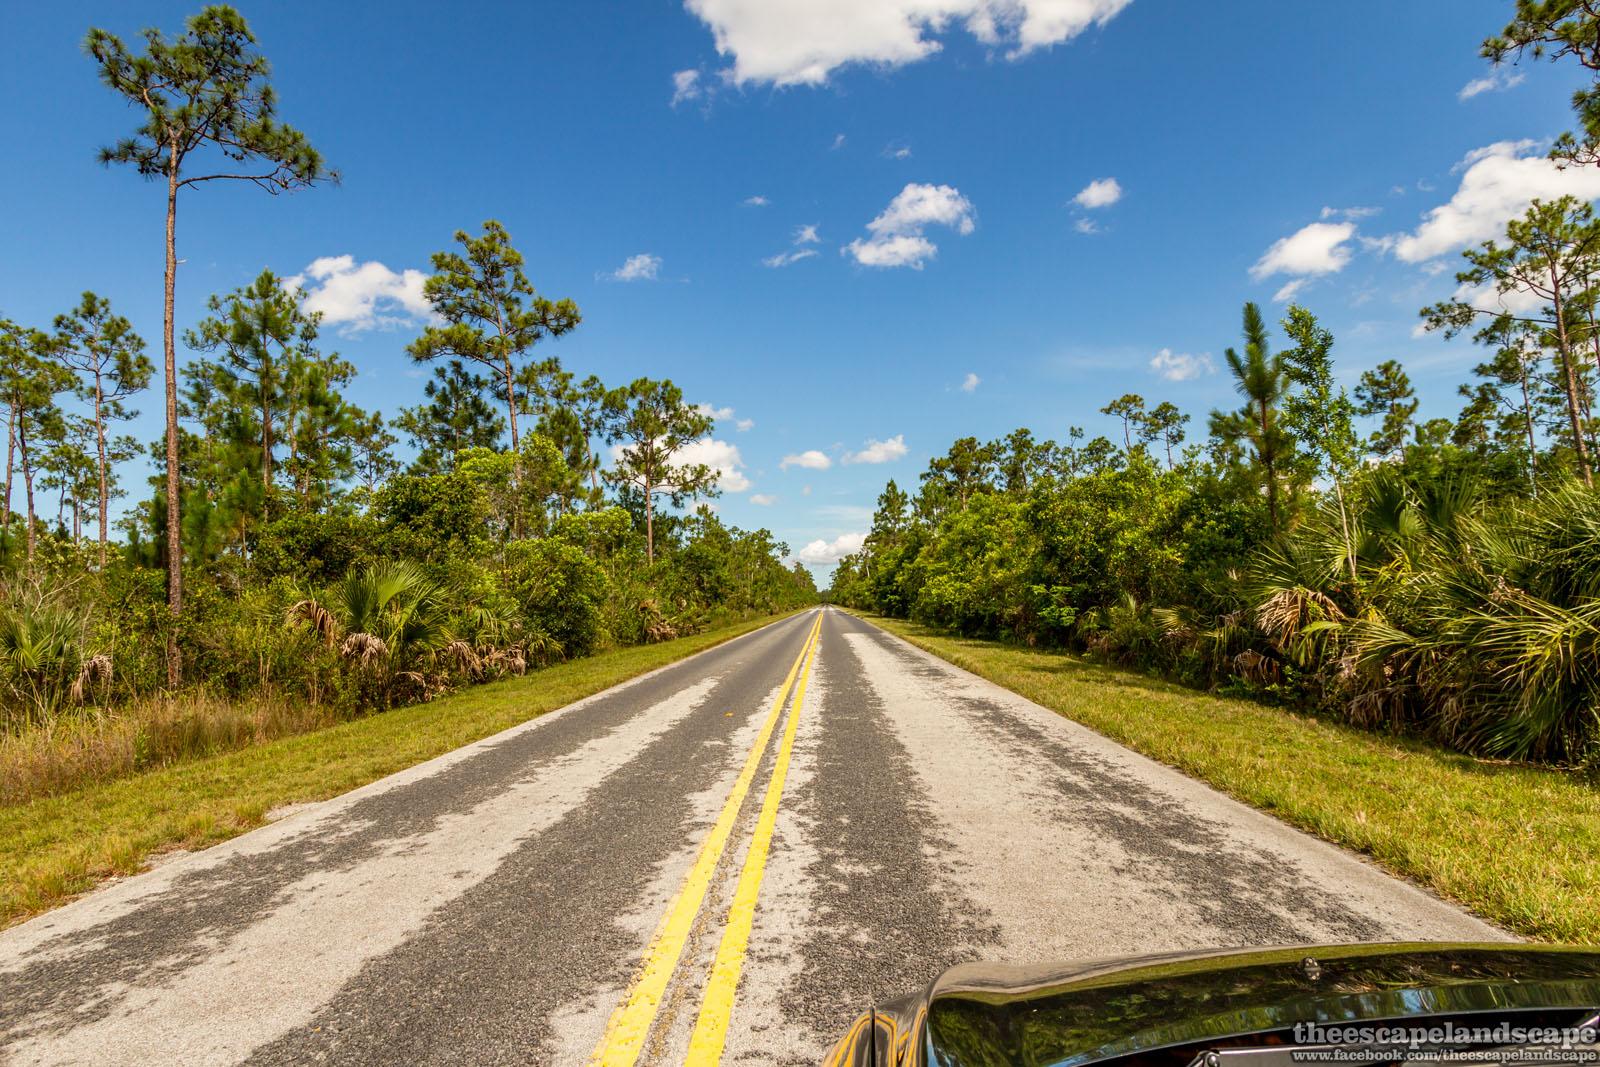 everglades_nemzeti_park_florida_07